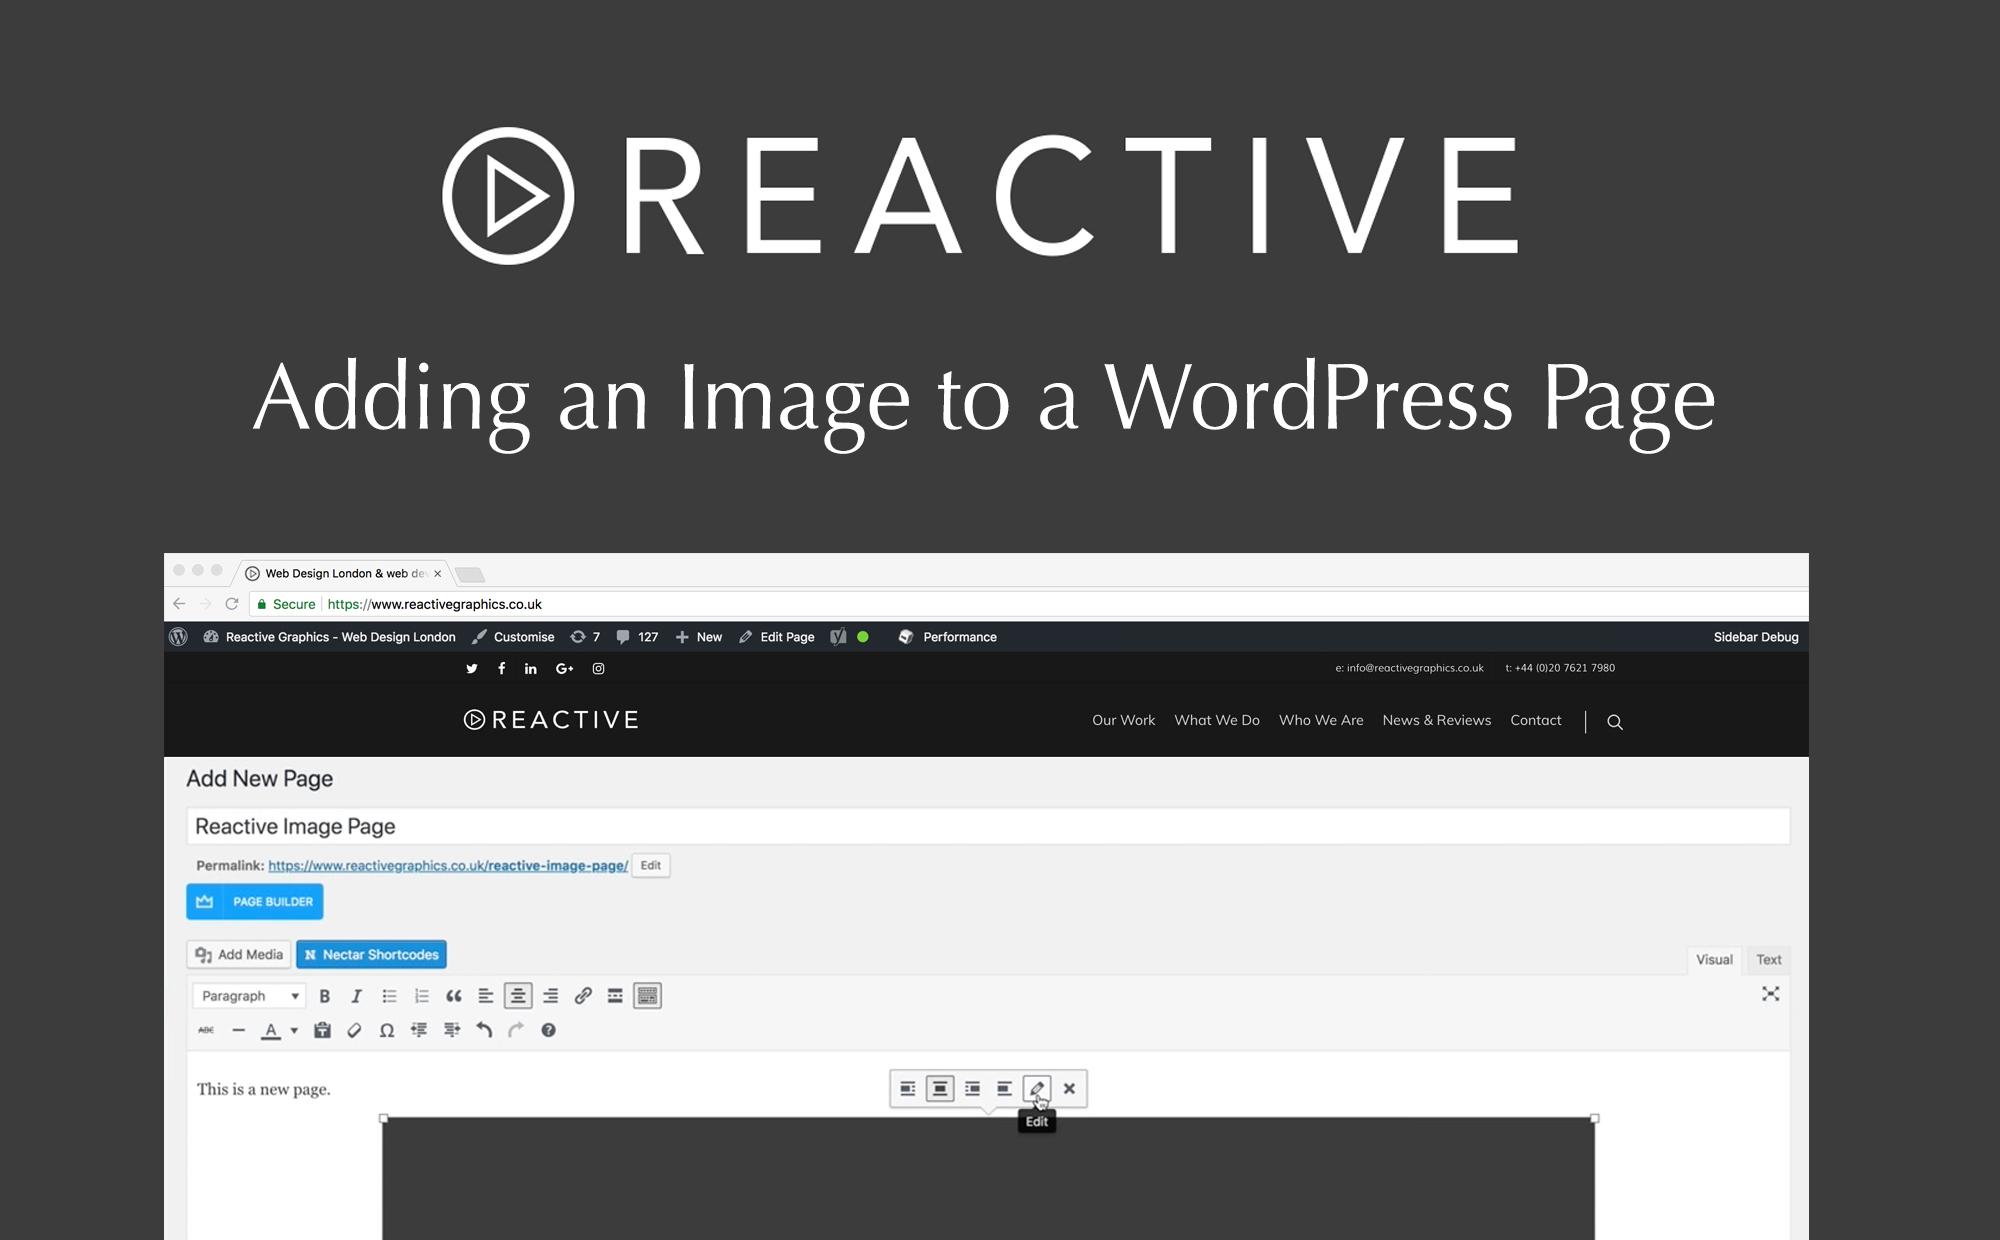 Adding an image to a wordpress page